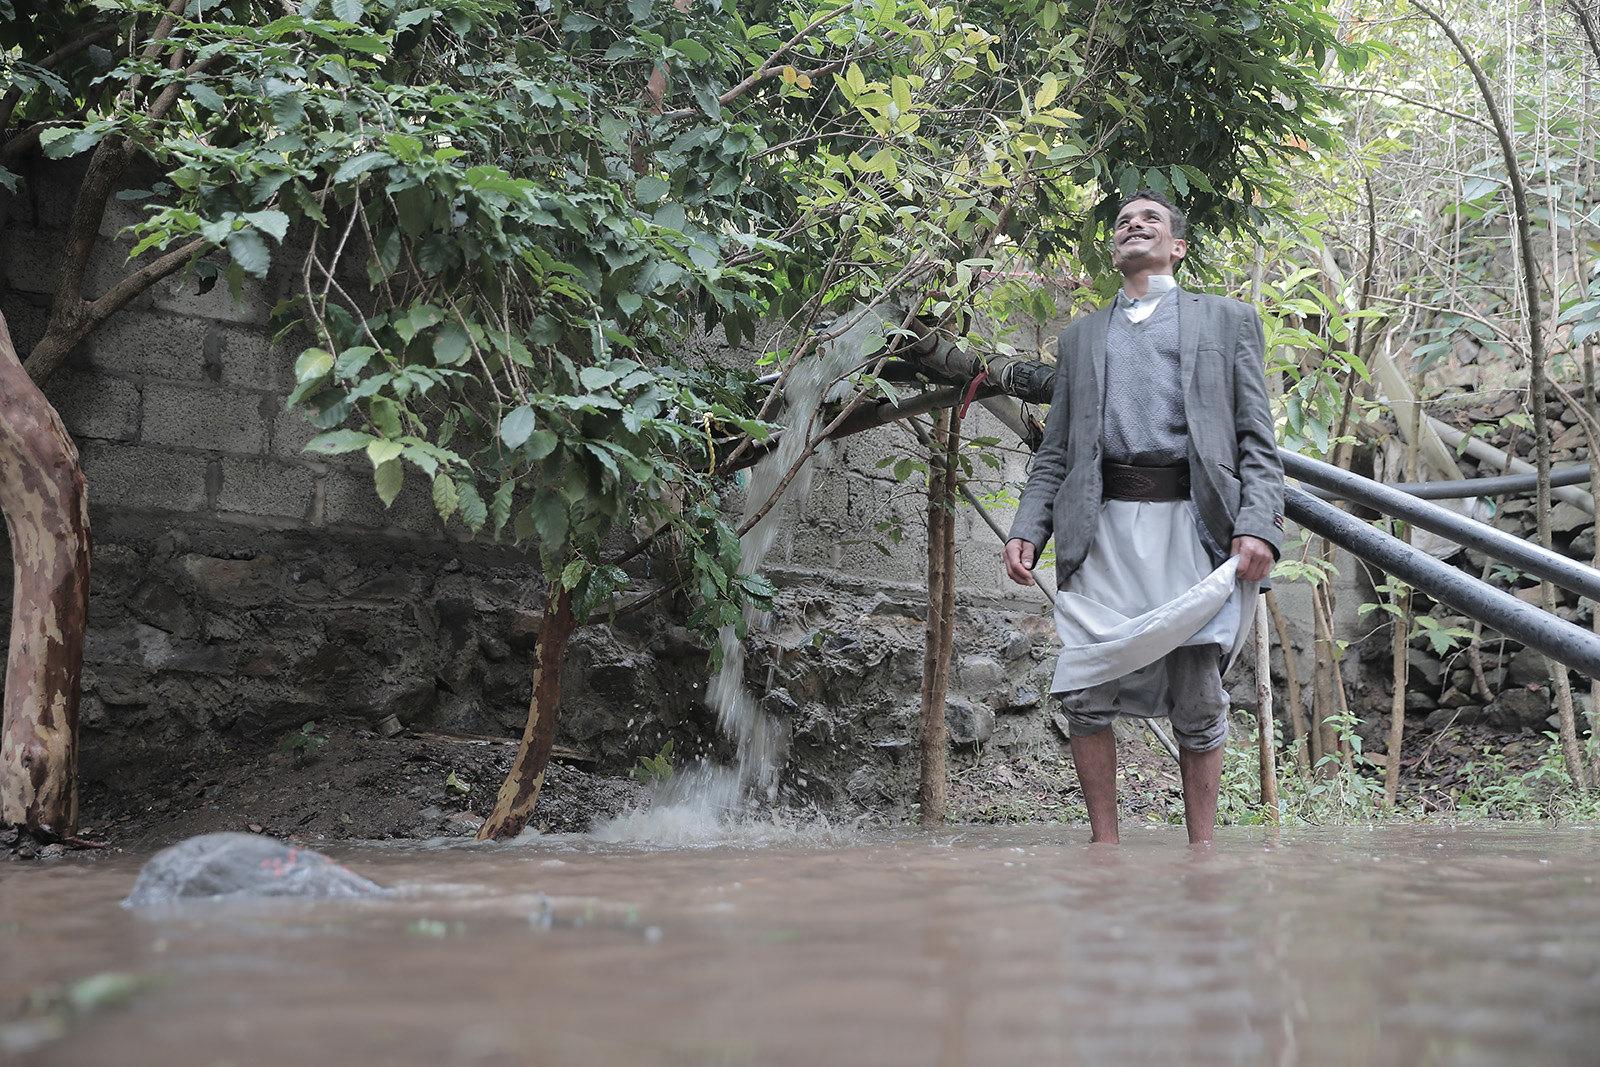 Solar powered water pumps in Yemen